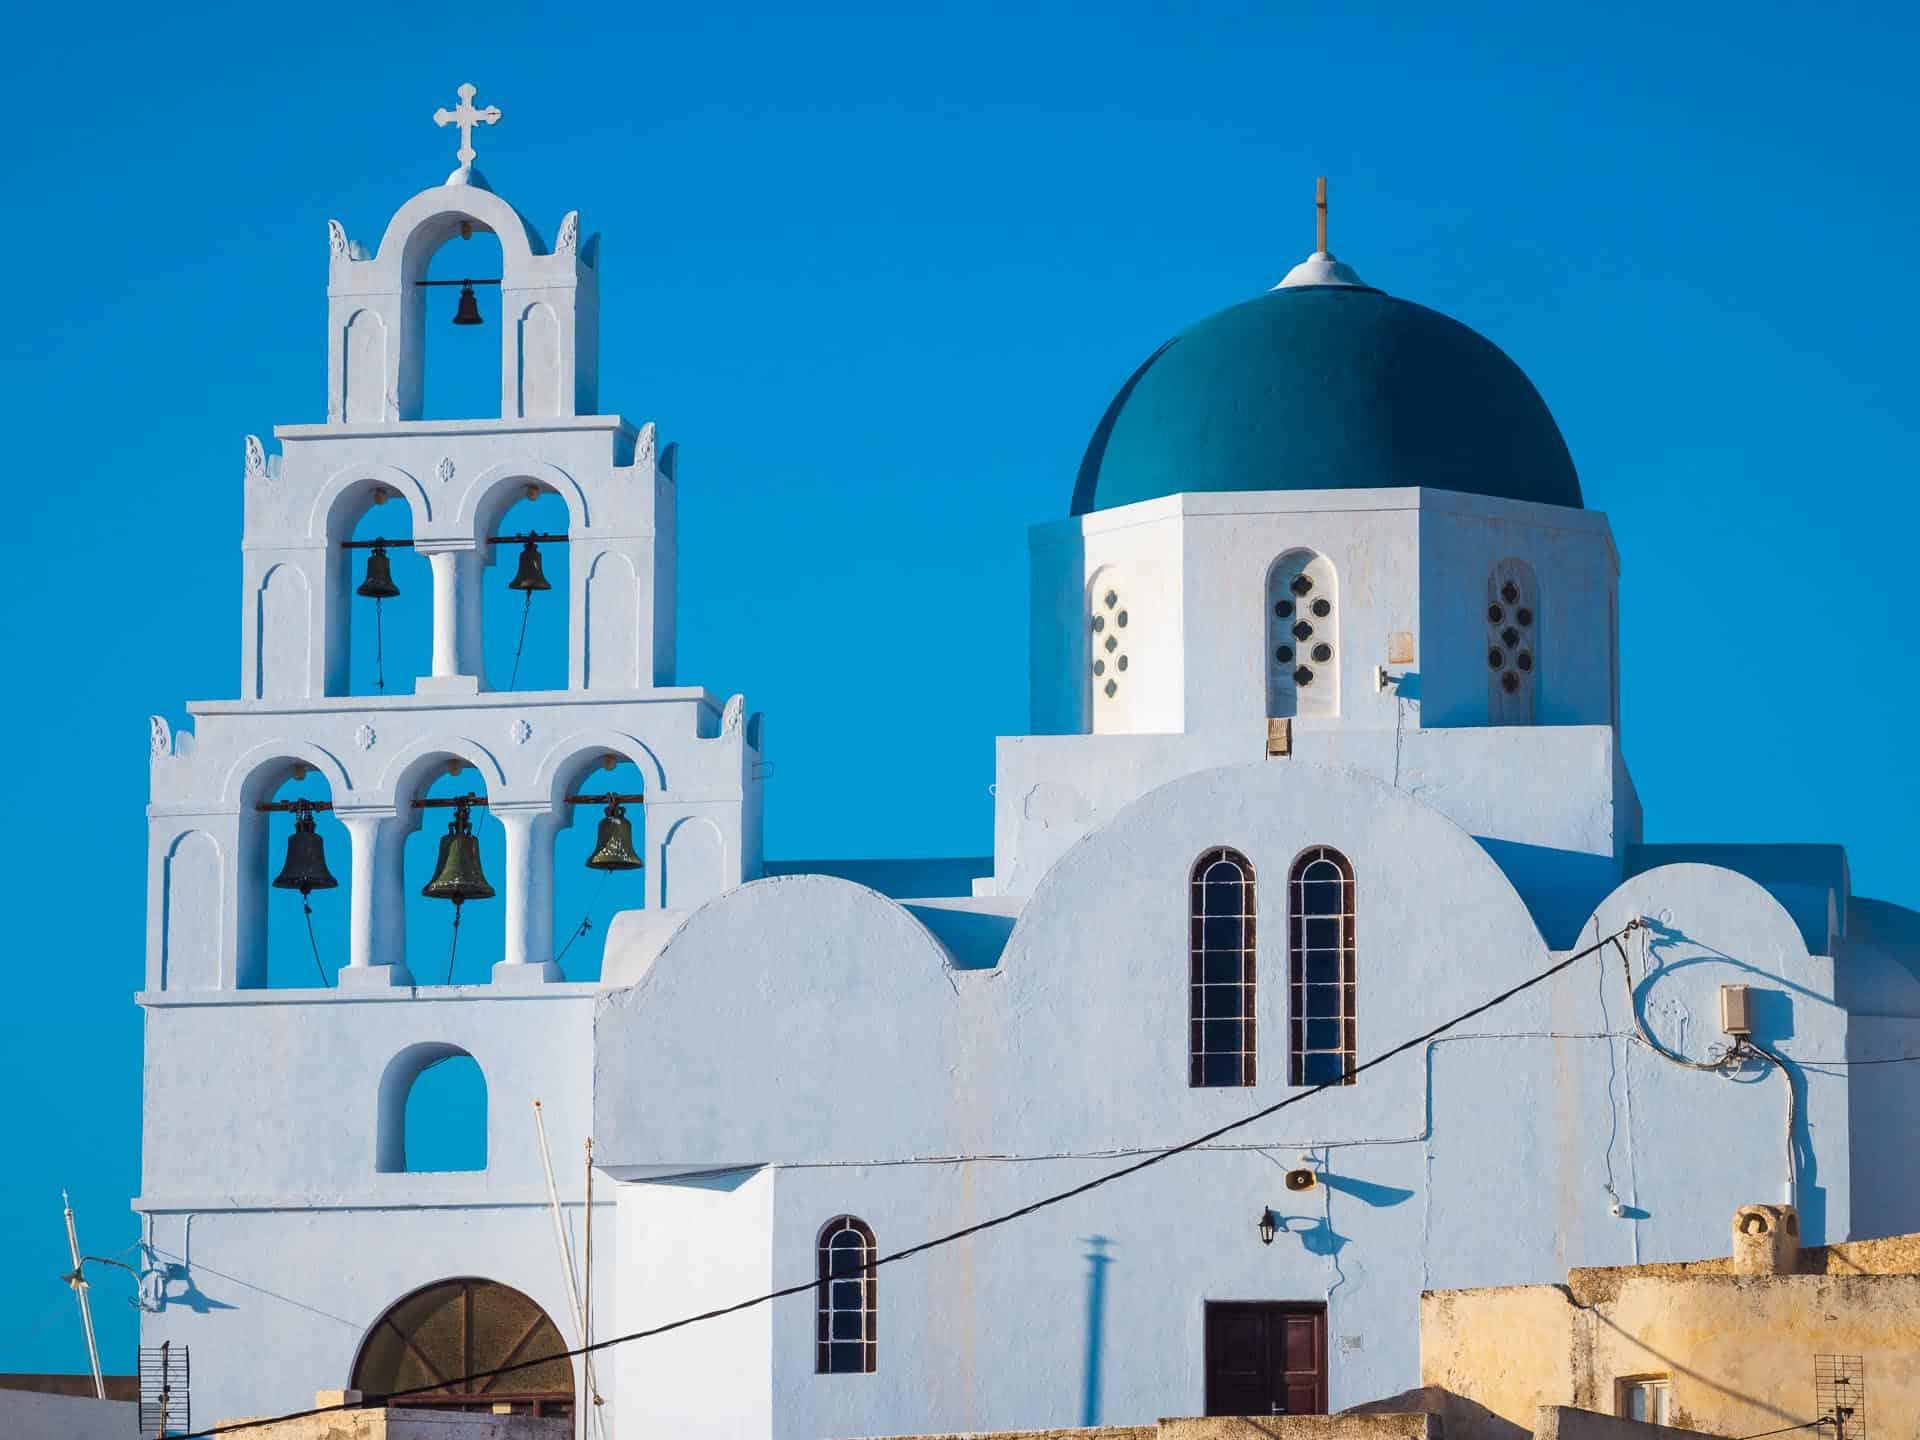 pyrgos santorini blue dome and bells